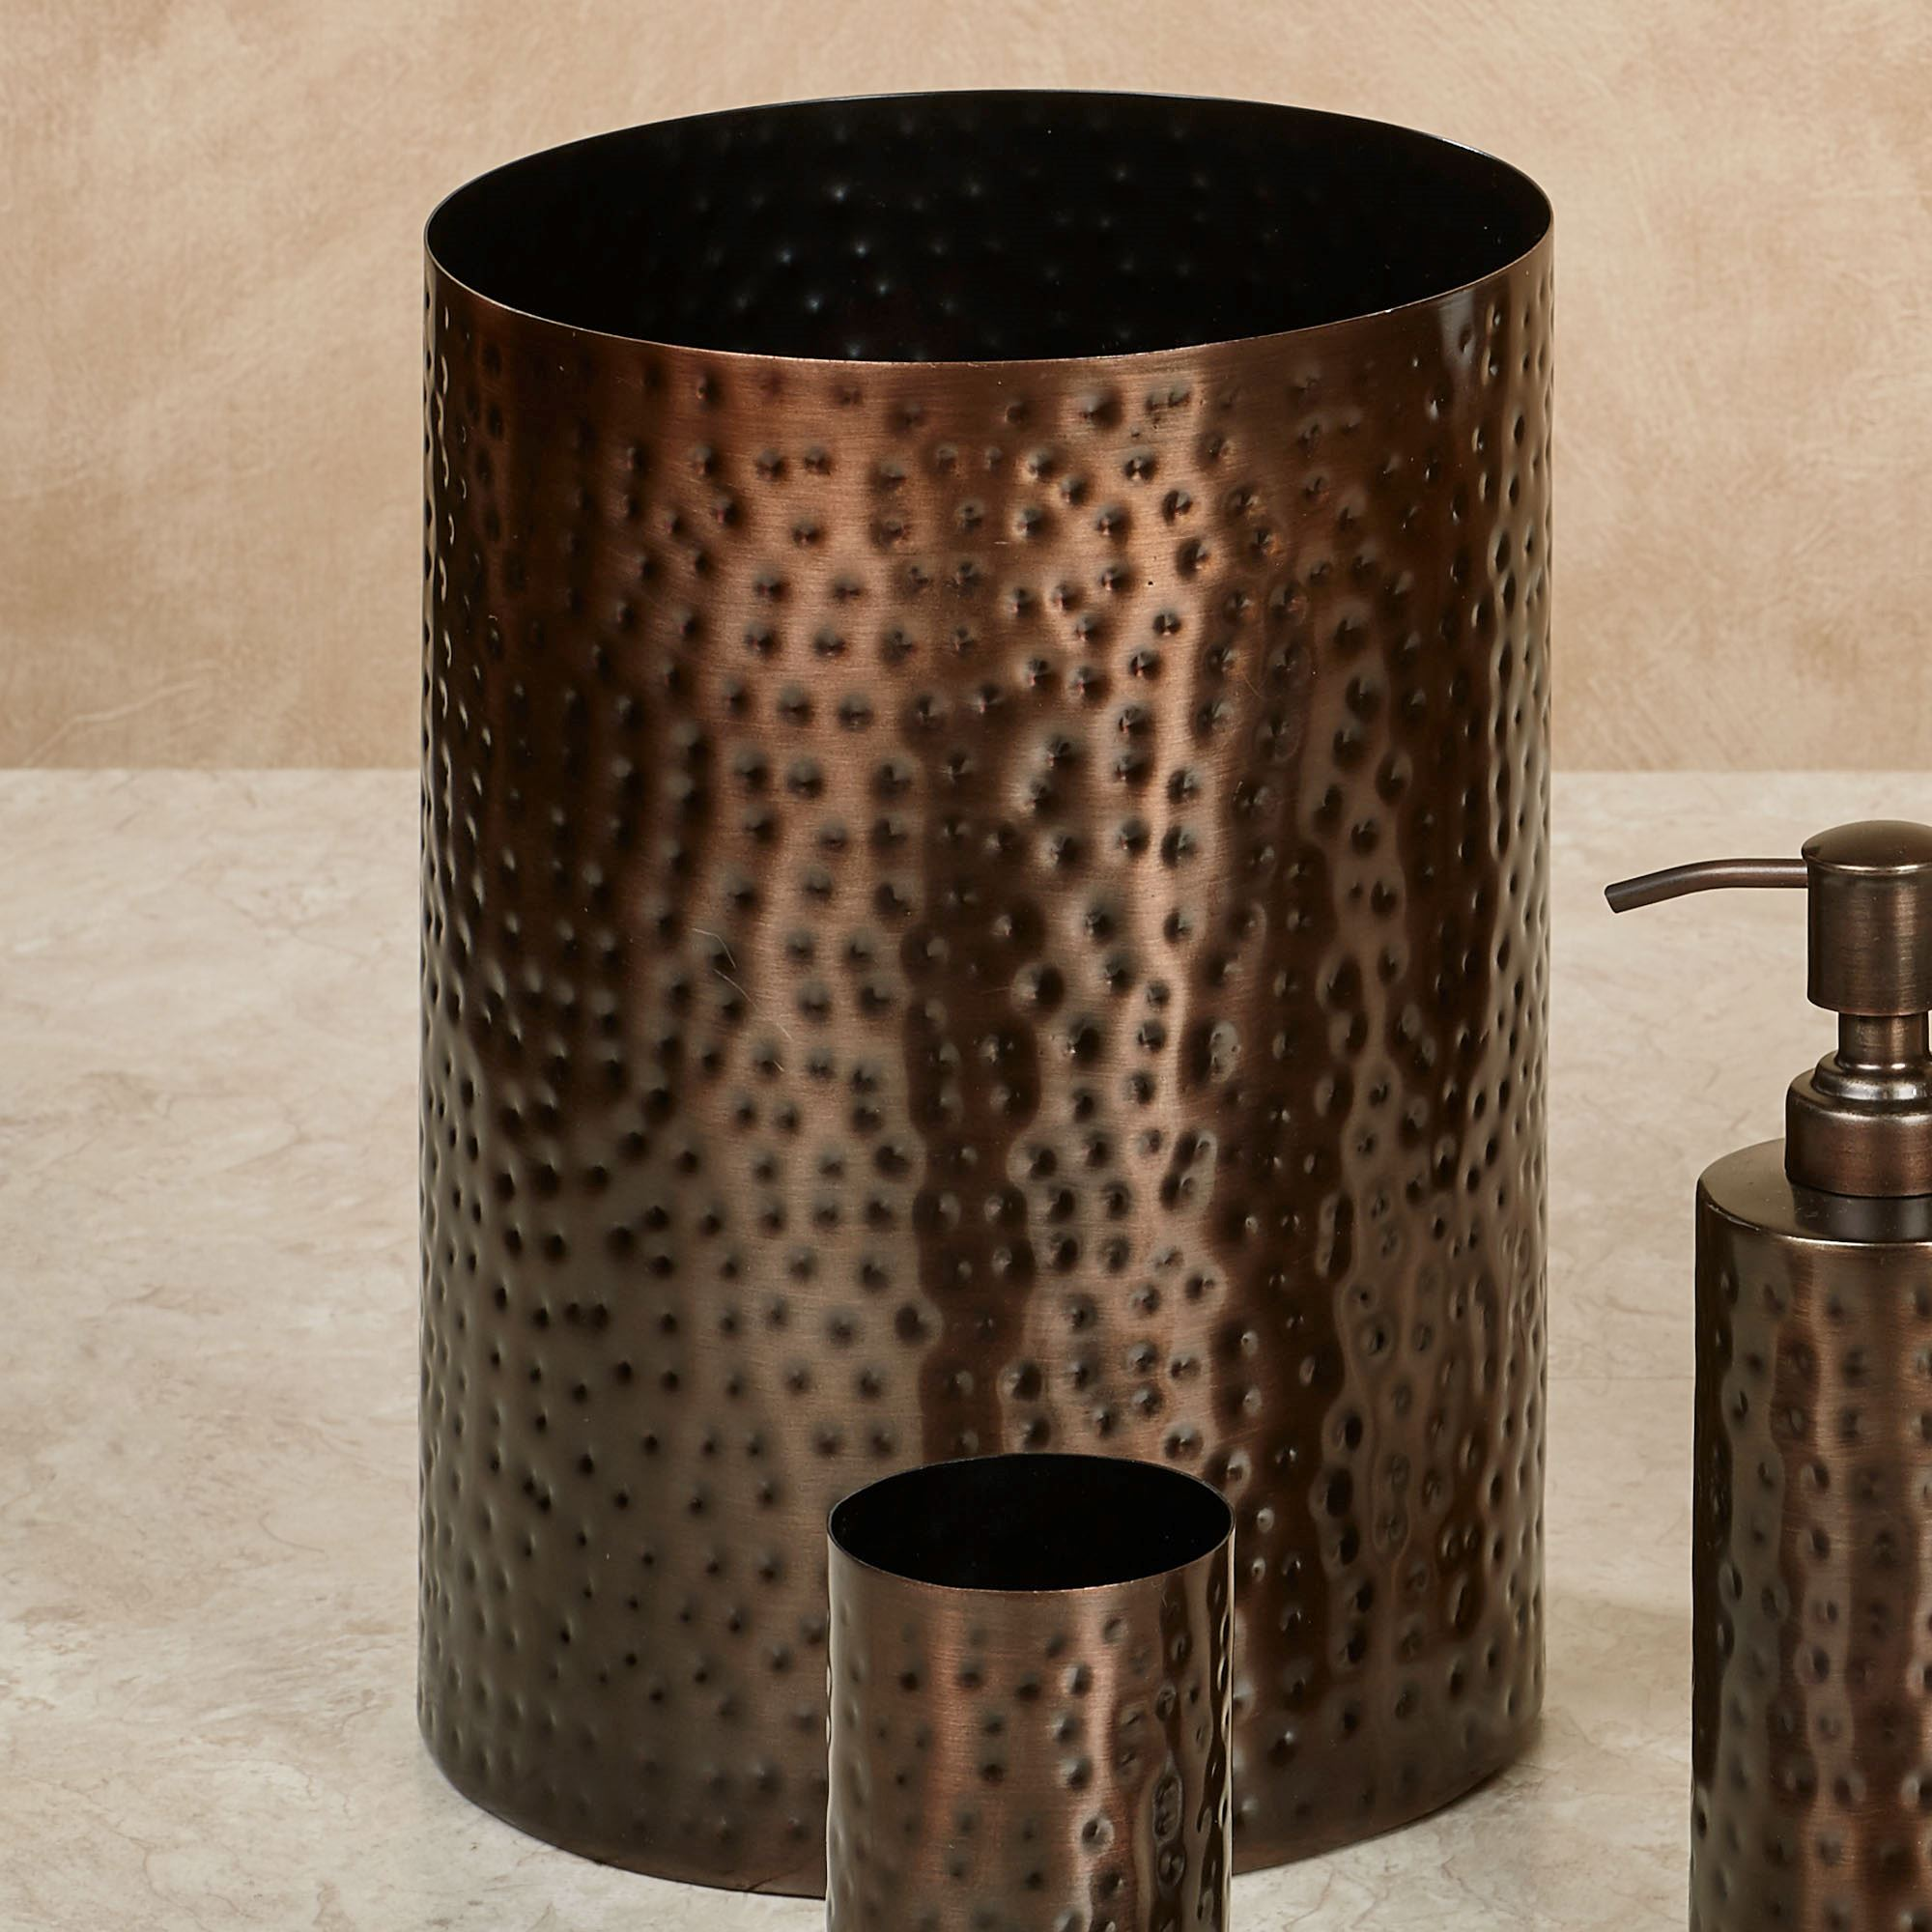 Pressed metal bronze bath accessories by j queen new york for Oil rubbed bronze bathroom wastebasket